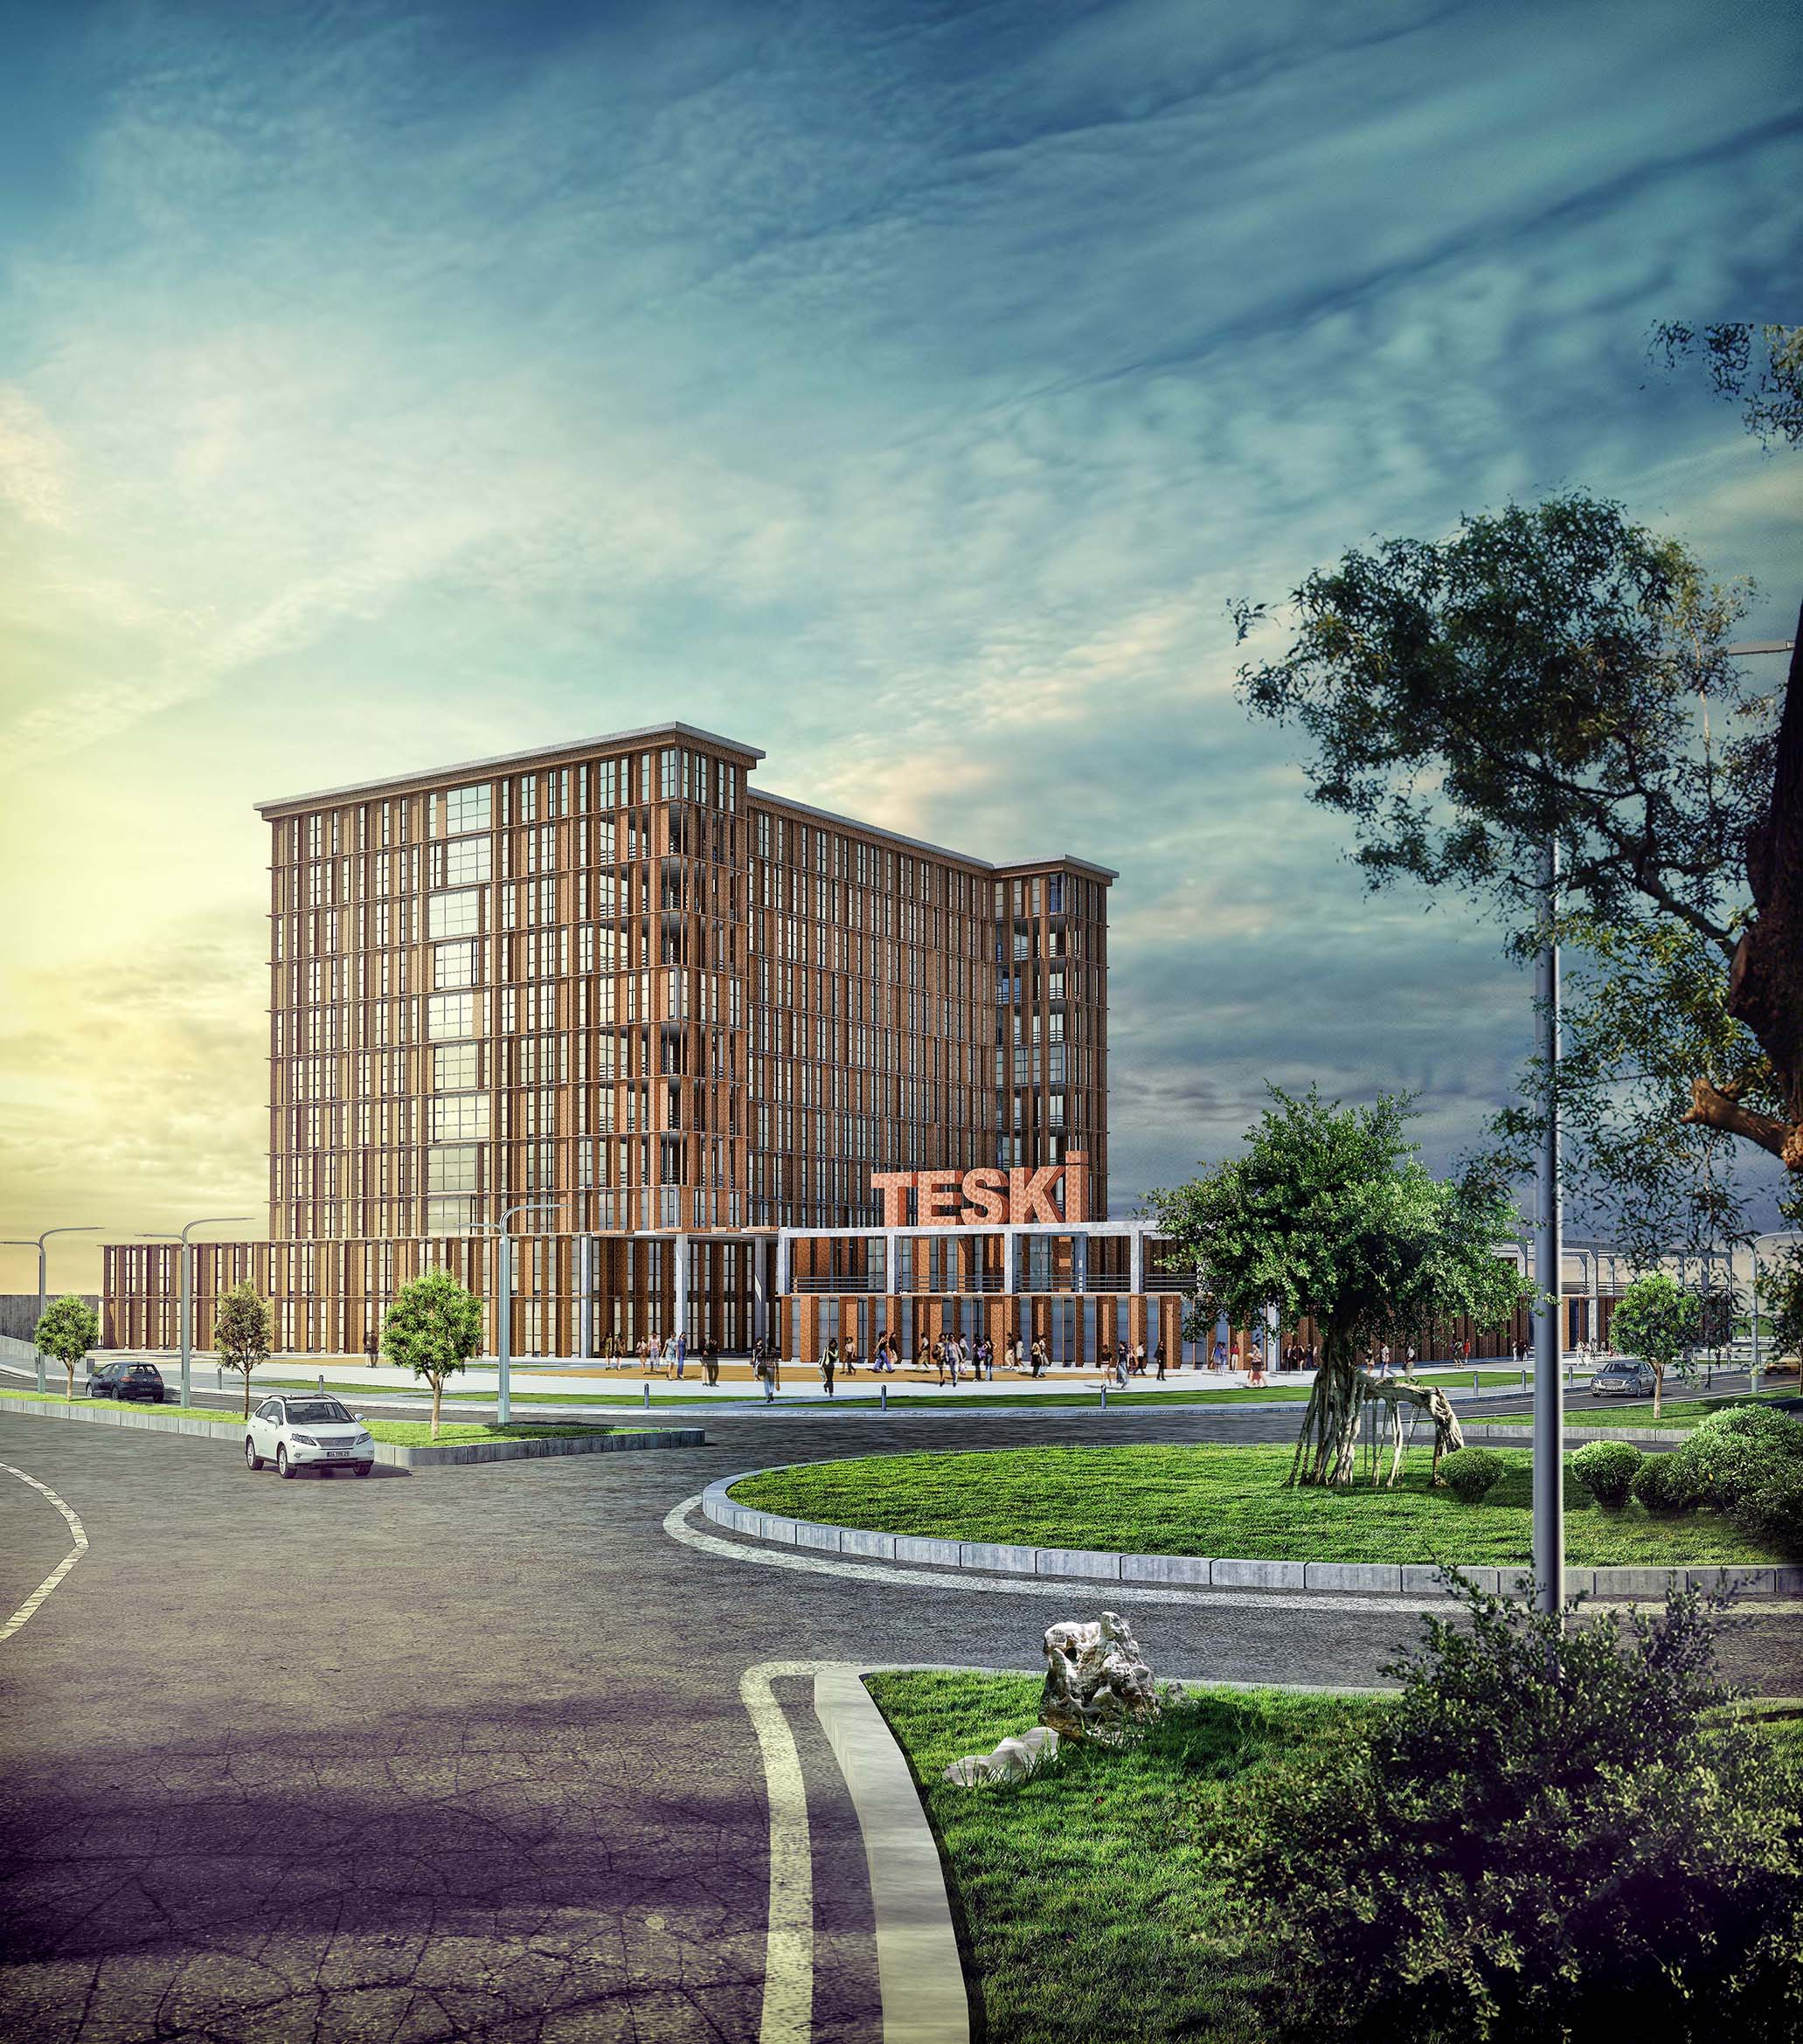 TESKİ Service Building